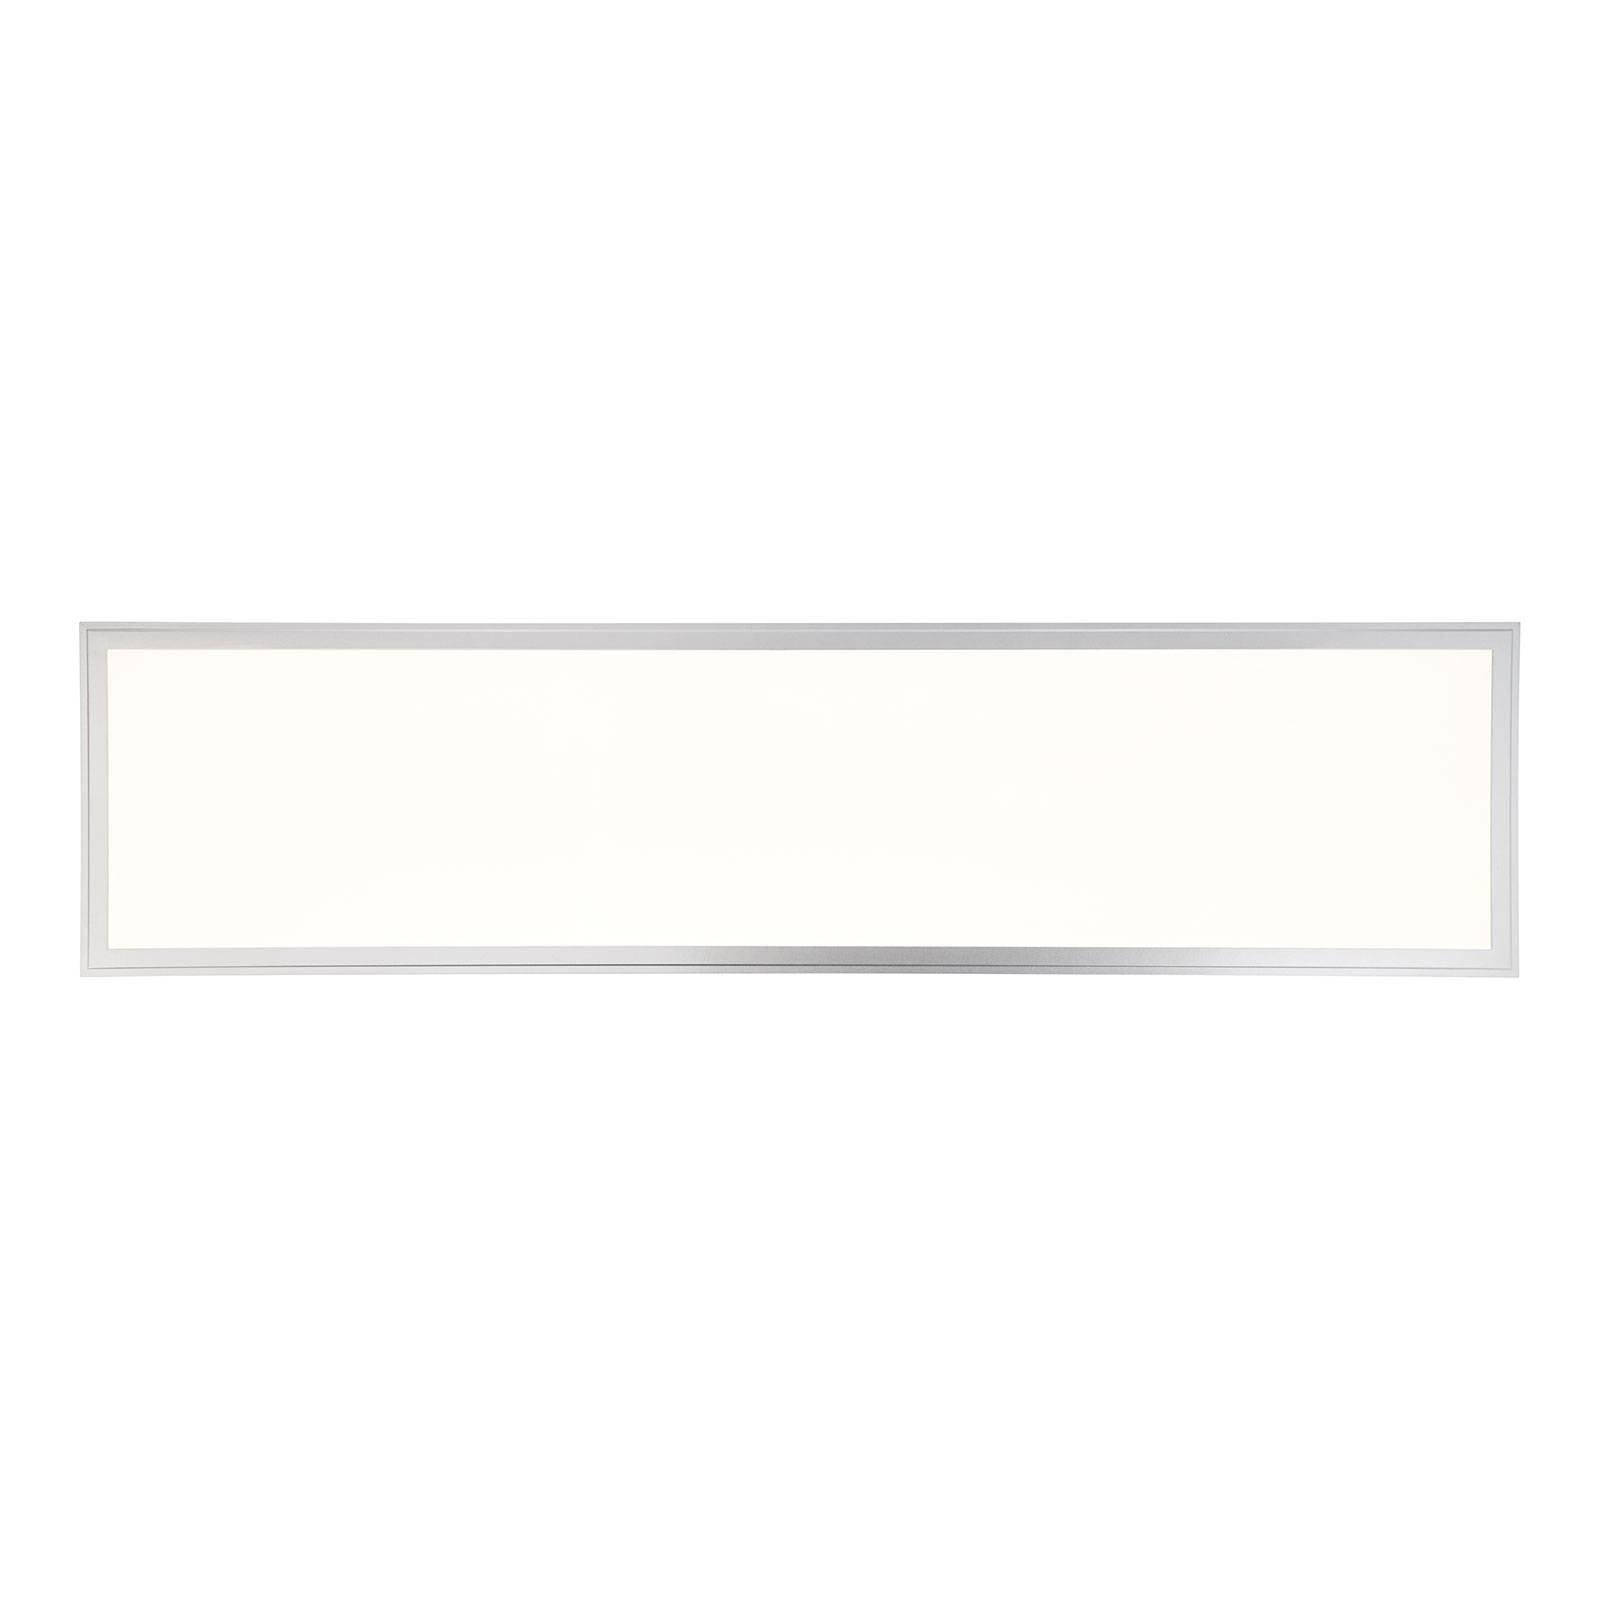 LED-taklampe Alissa, 119,5x29,5 cm